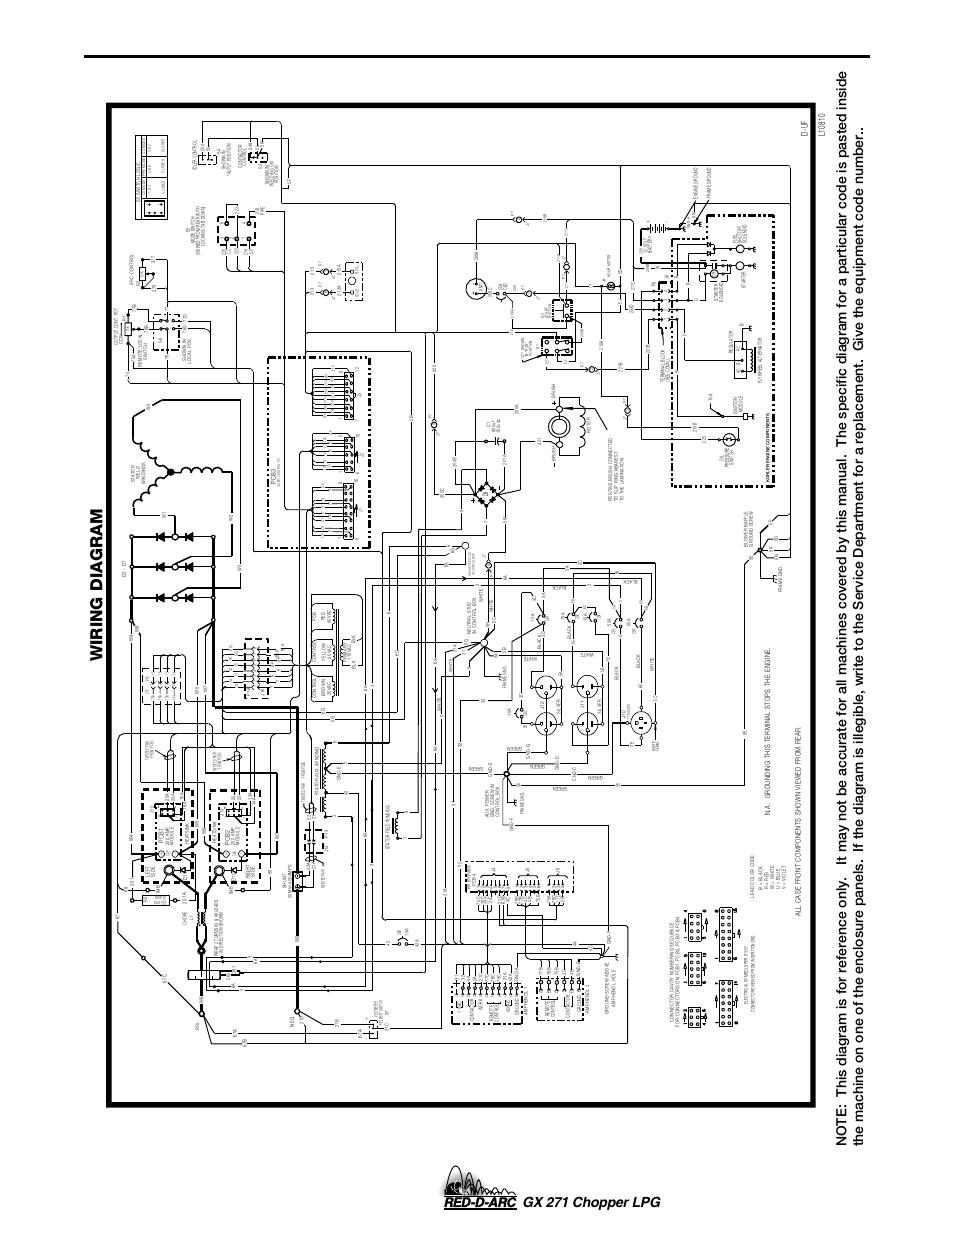 medium resolution of diagrams gx 271 chopper lpg wiring diagram lincoln electric im635 red d arc gx 271chopper lpg user manual page 44 48